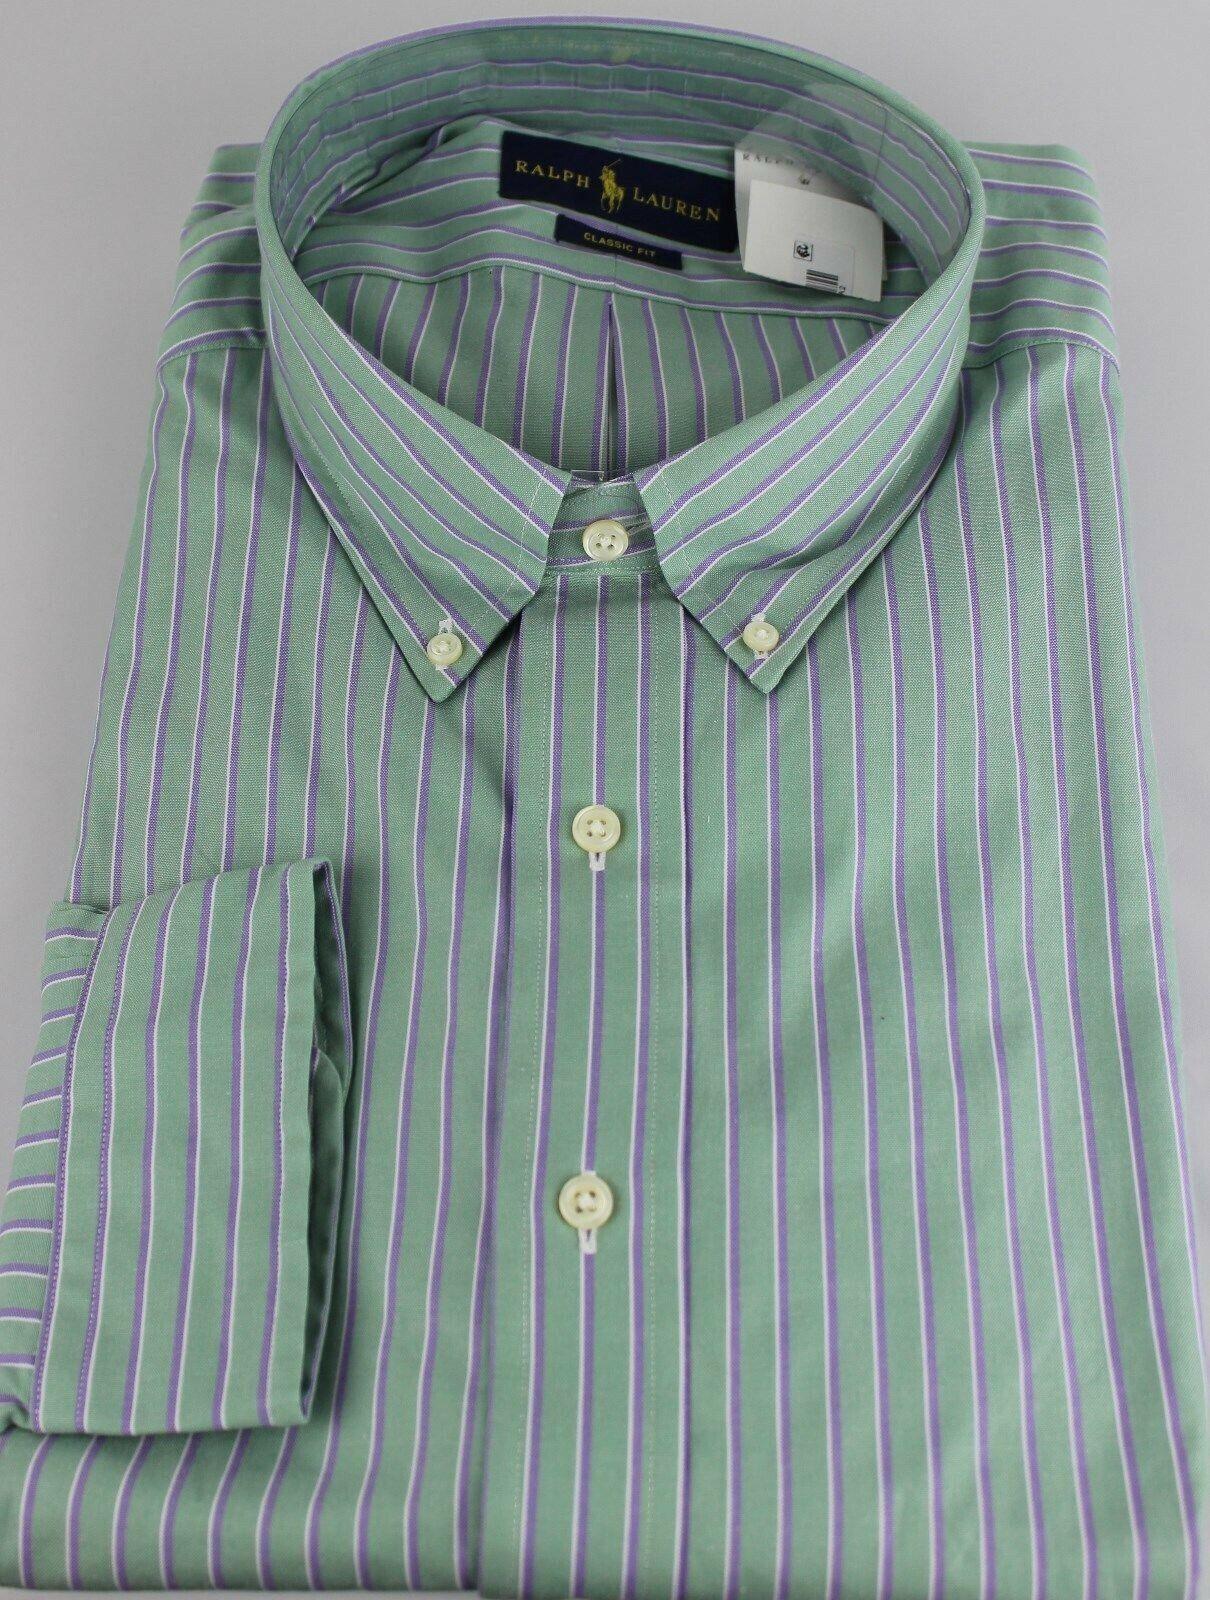 Polo Ralph Lauren Dress Shirt Mens 22 34 35 Classic Fit Green Purple White